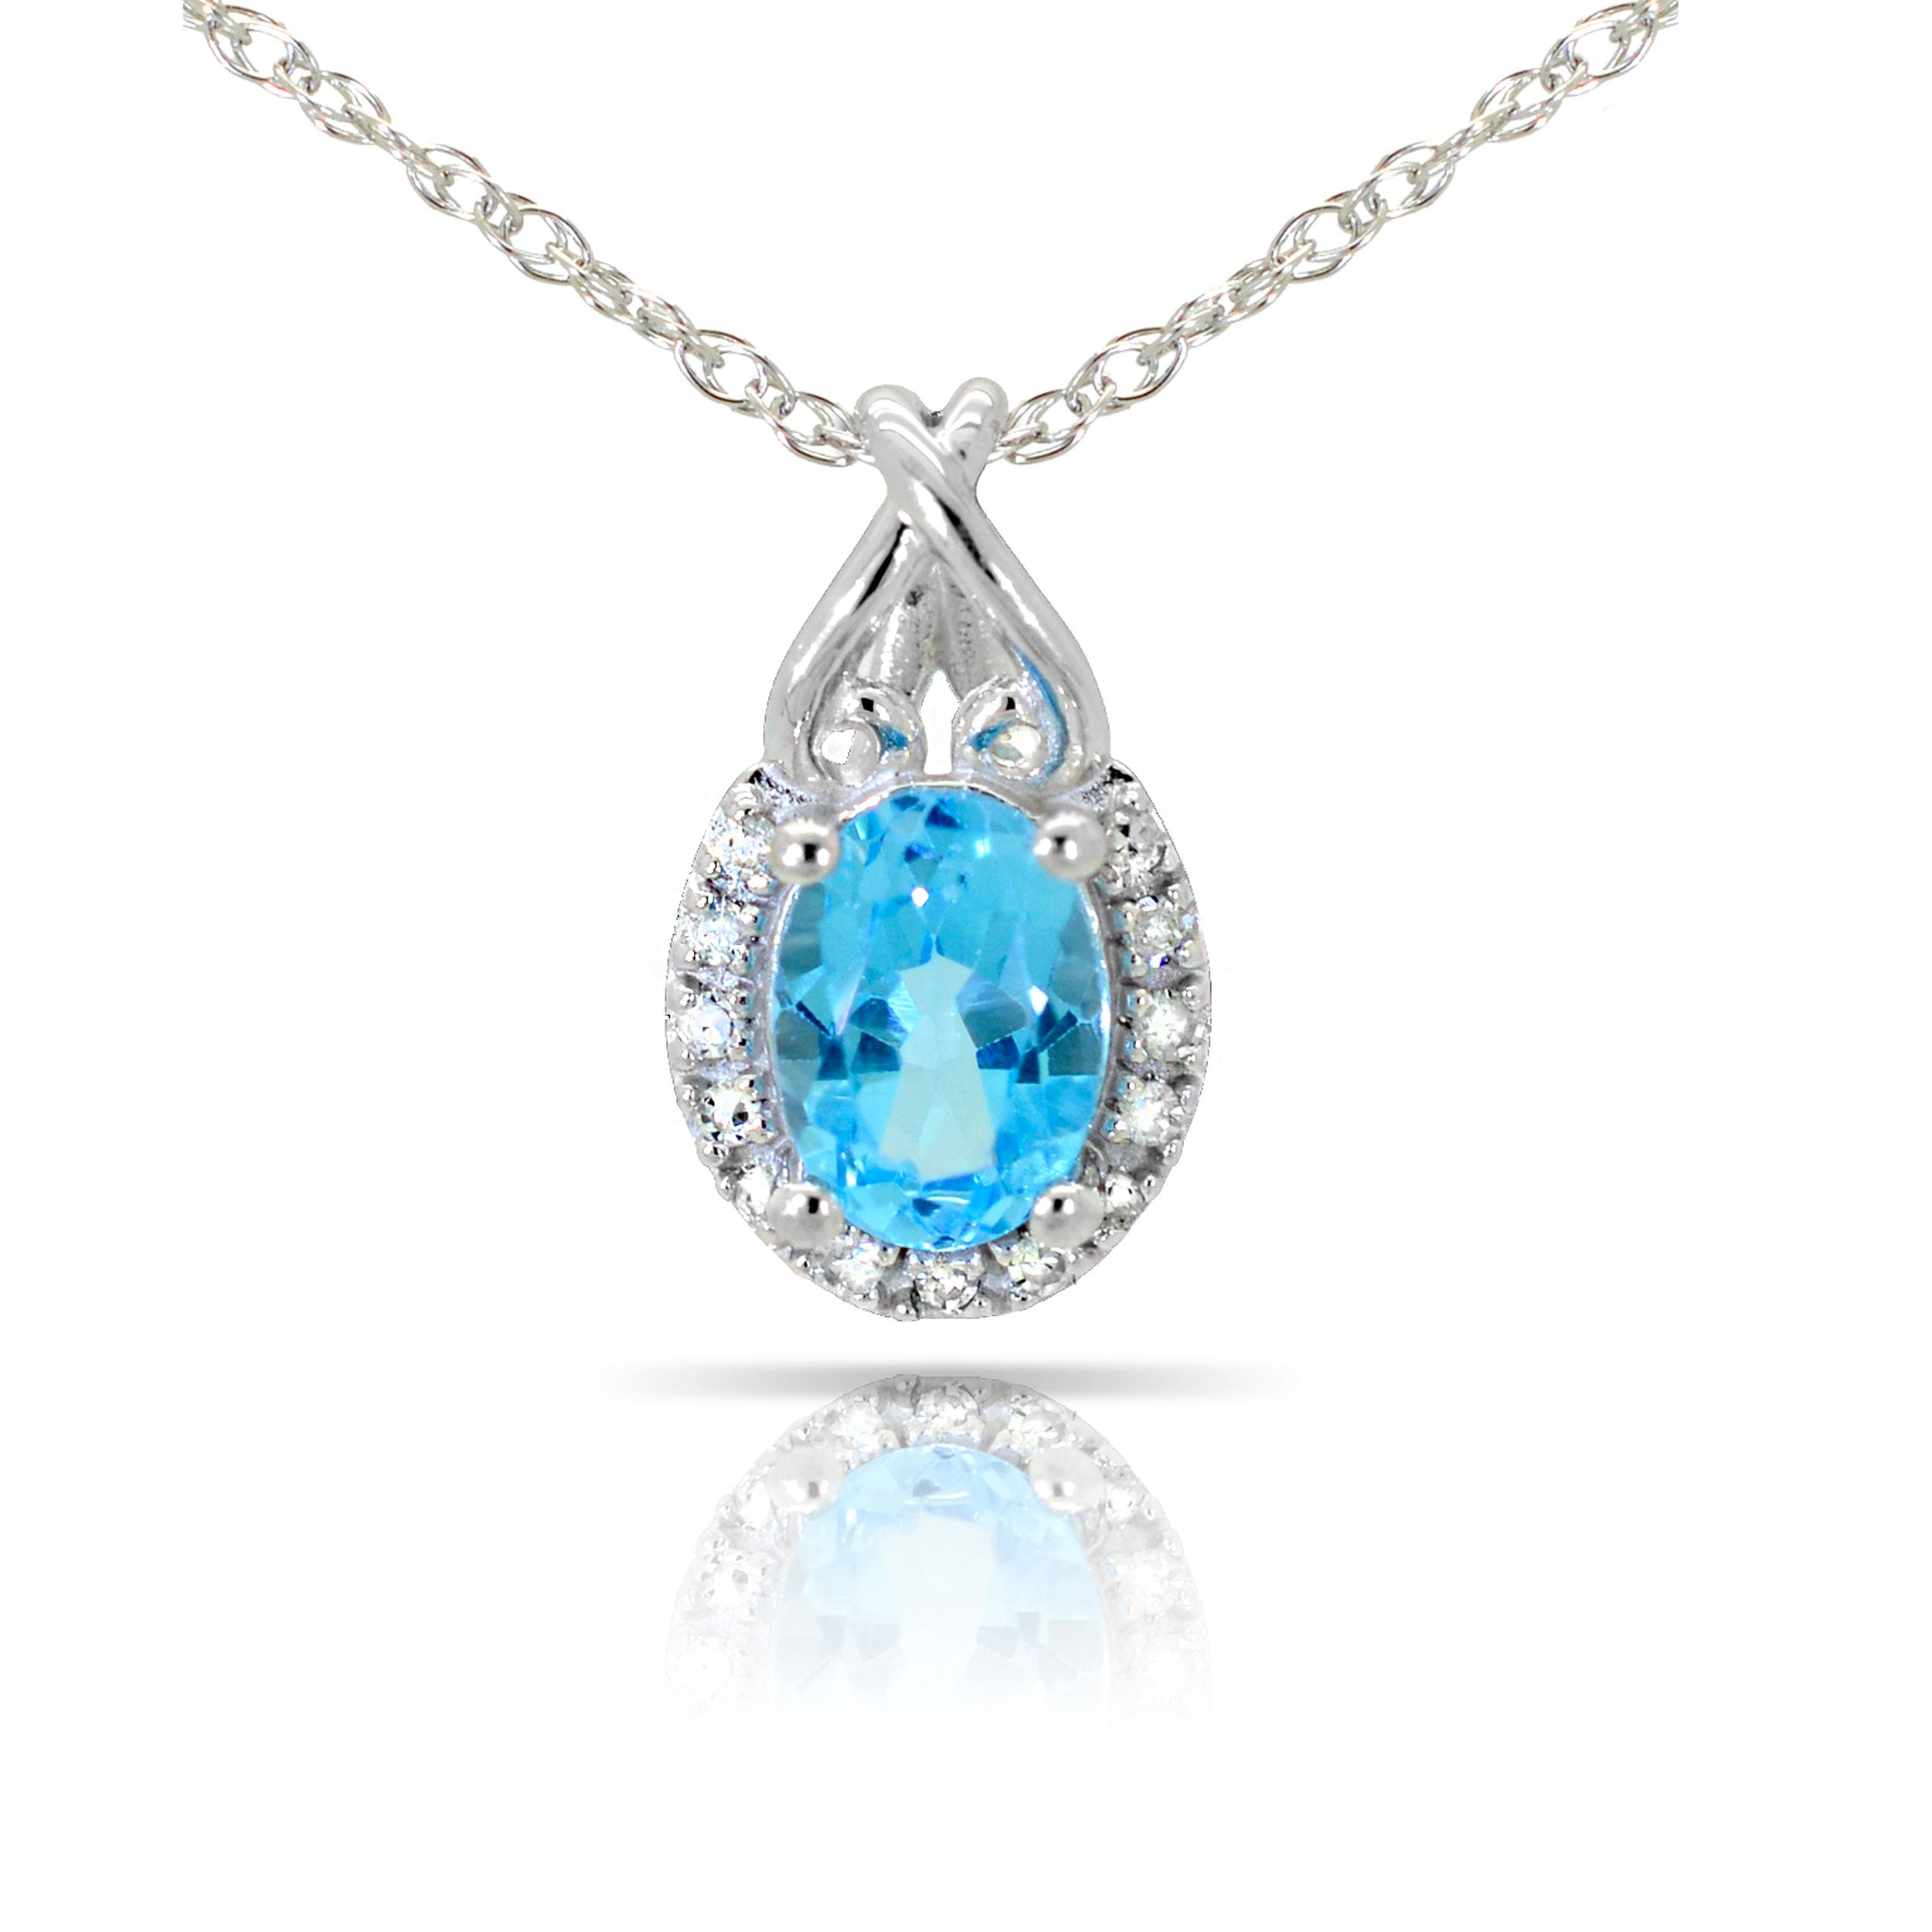 Blue Topaz & Diamond Oval Pendant in 10k White Gold